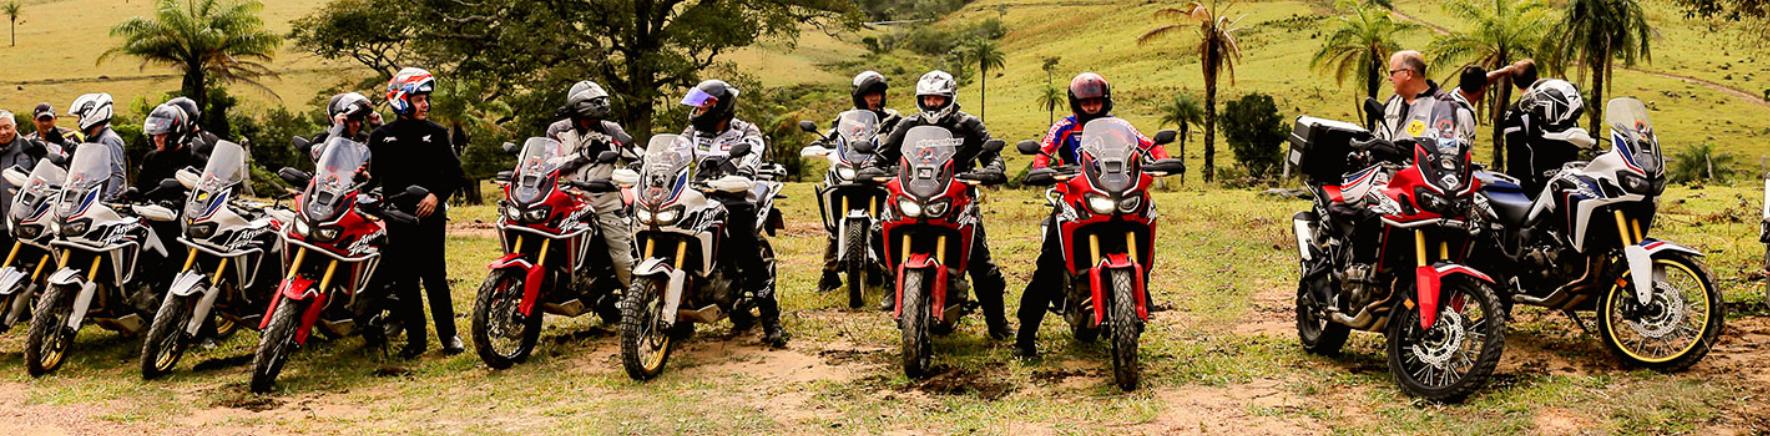 faixa aluguel de moto Honda Africa Twin.